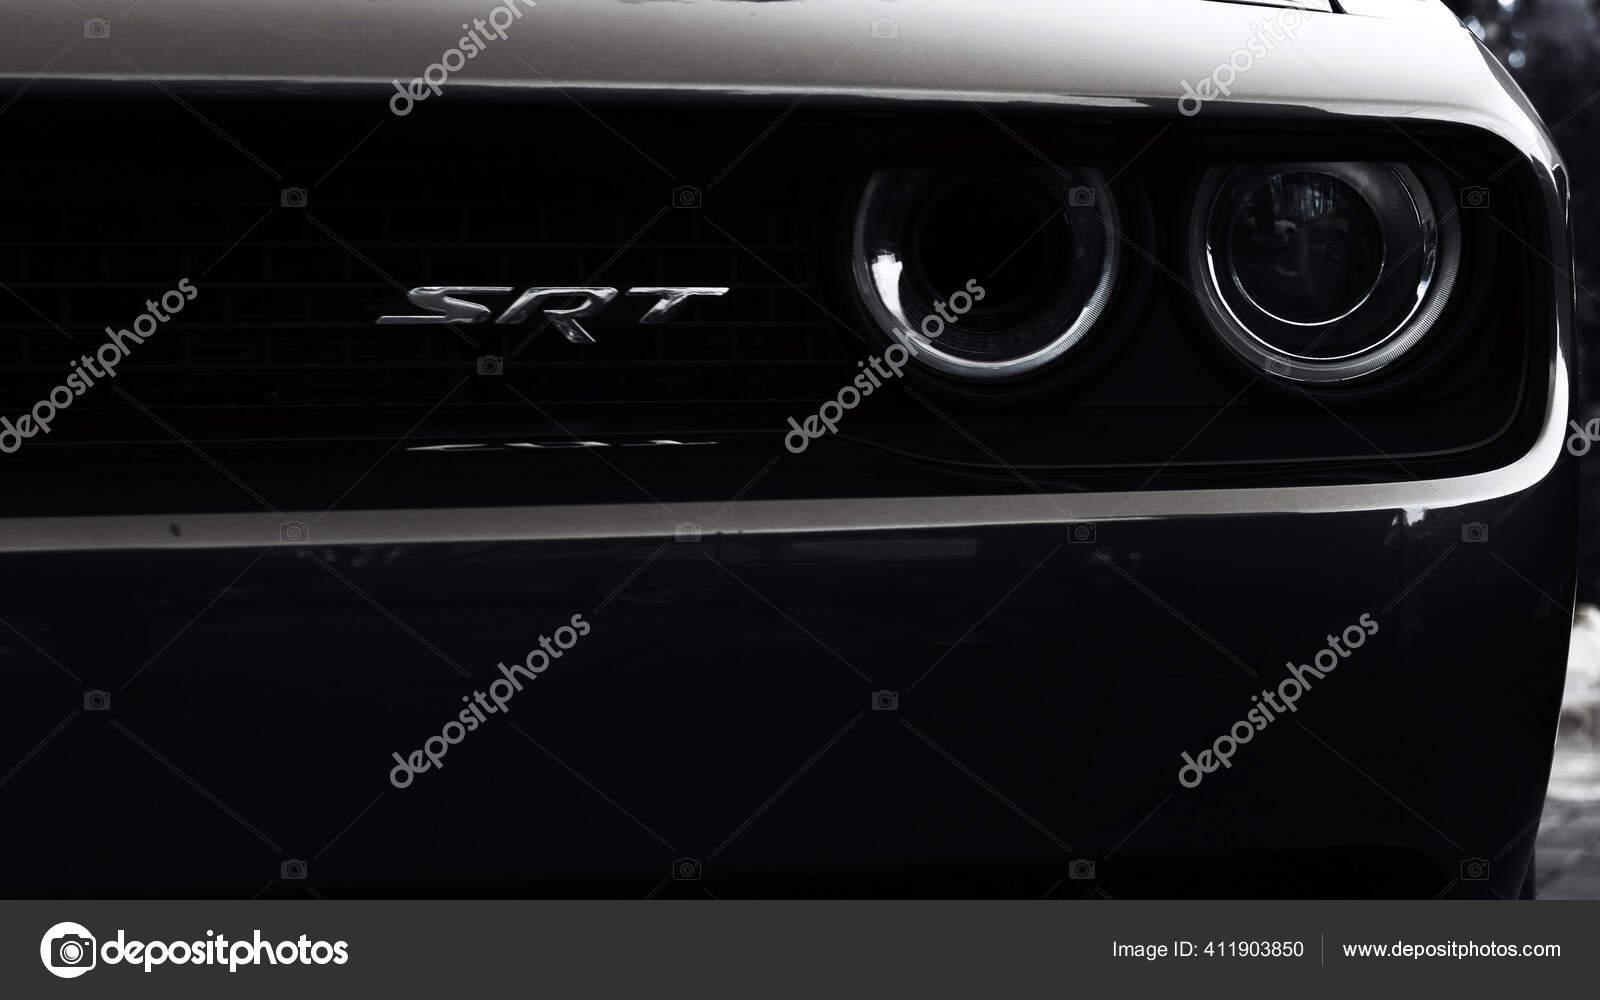 Tomsk Russia July 17 2020 Black Dodge Challenger Srt Hellcat Automobile Close Up Front View Stock Editorial Photo C Alexeykhodus 411903850